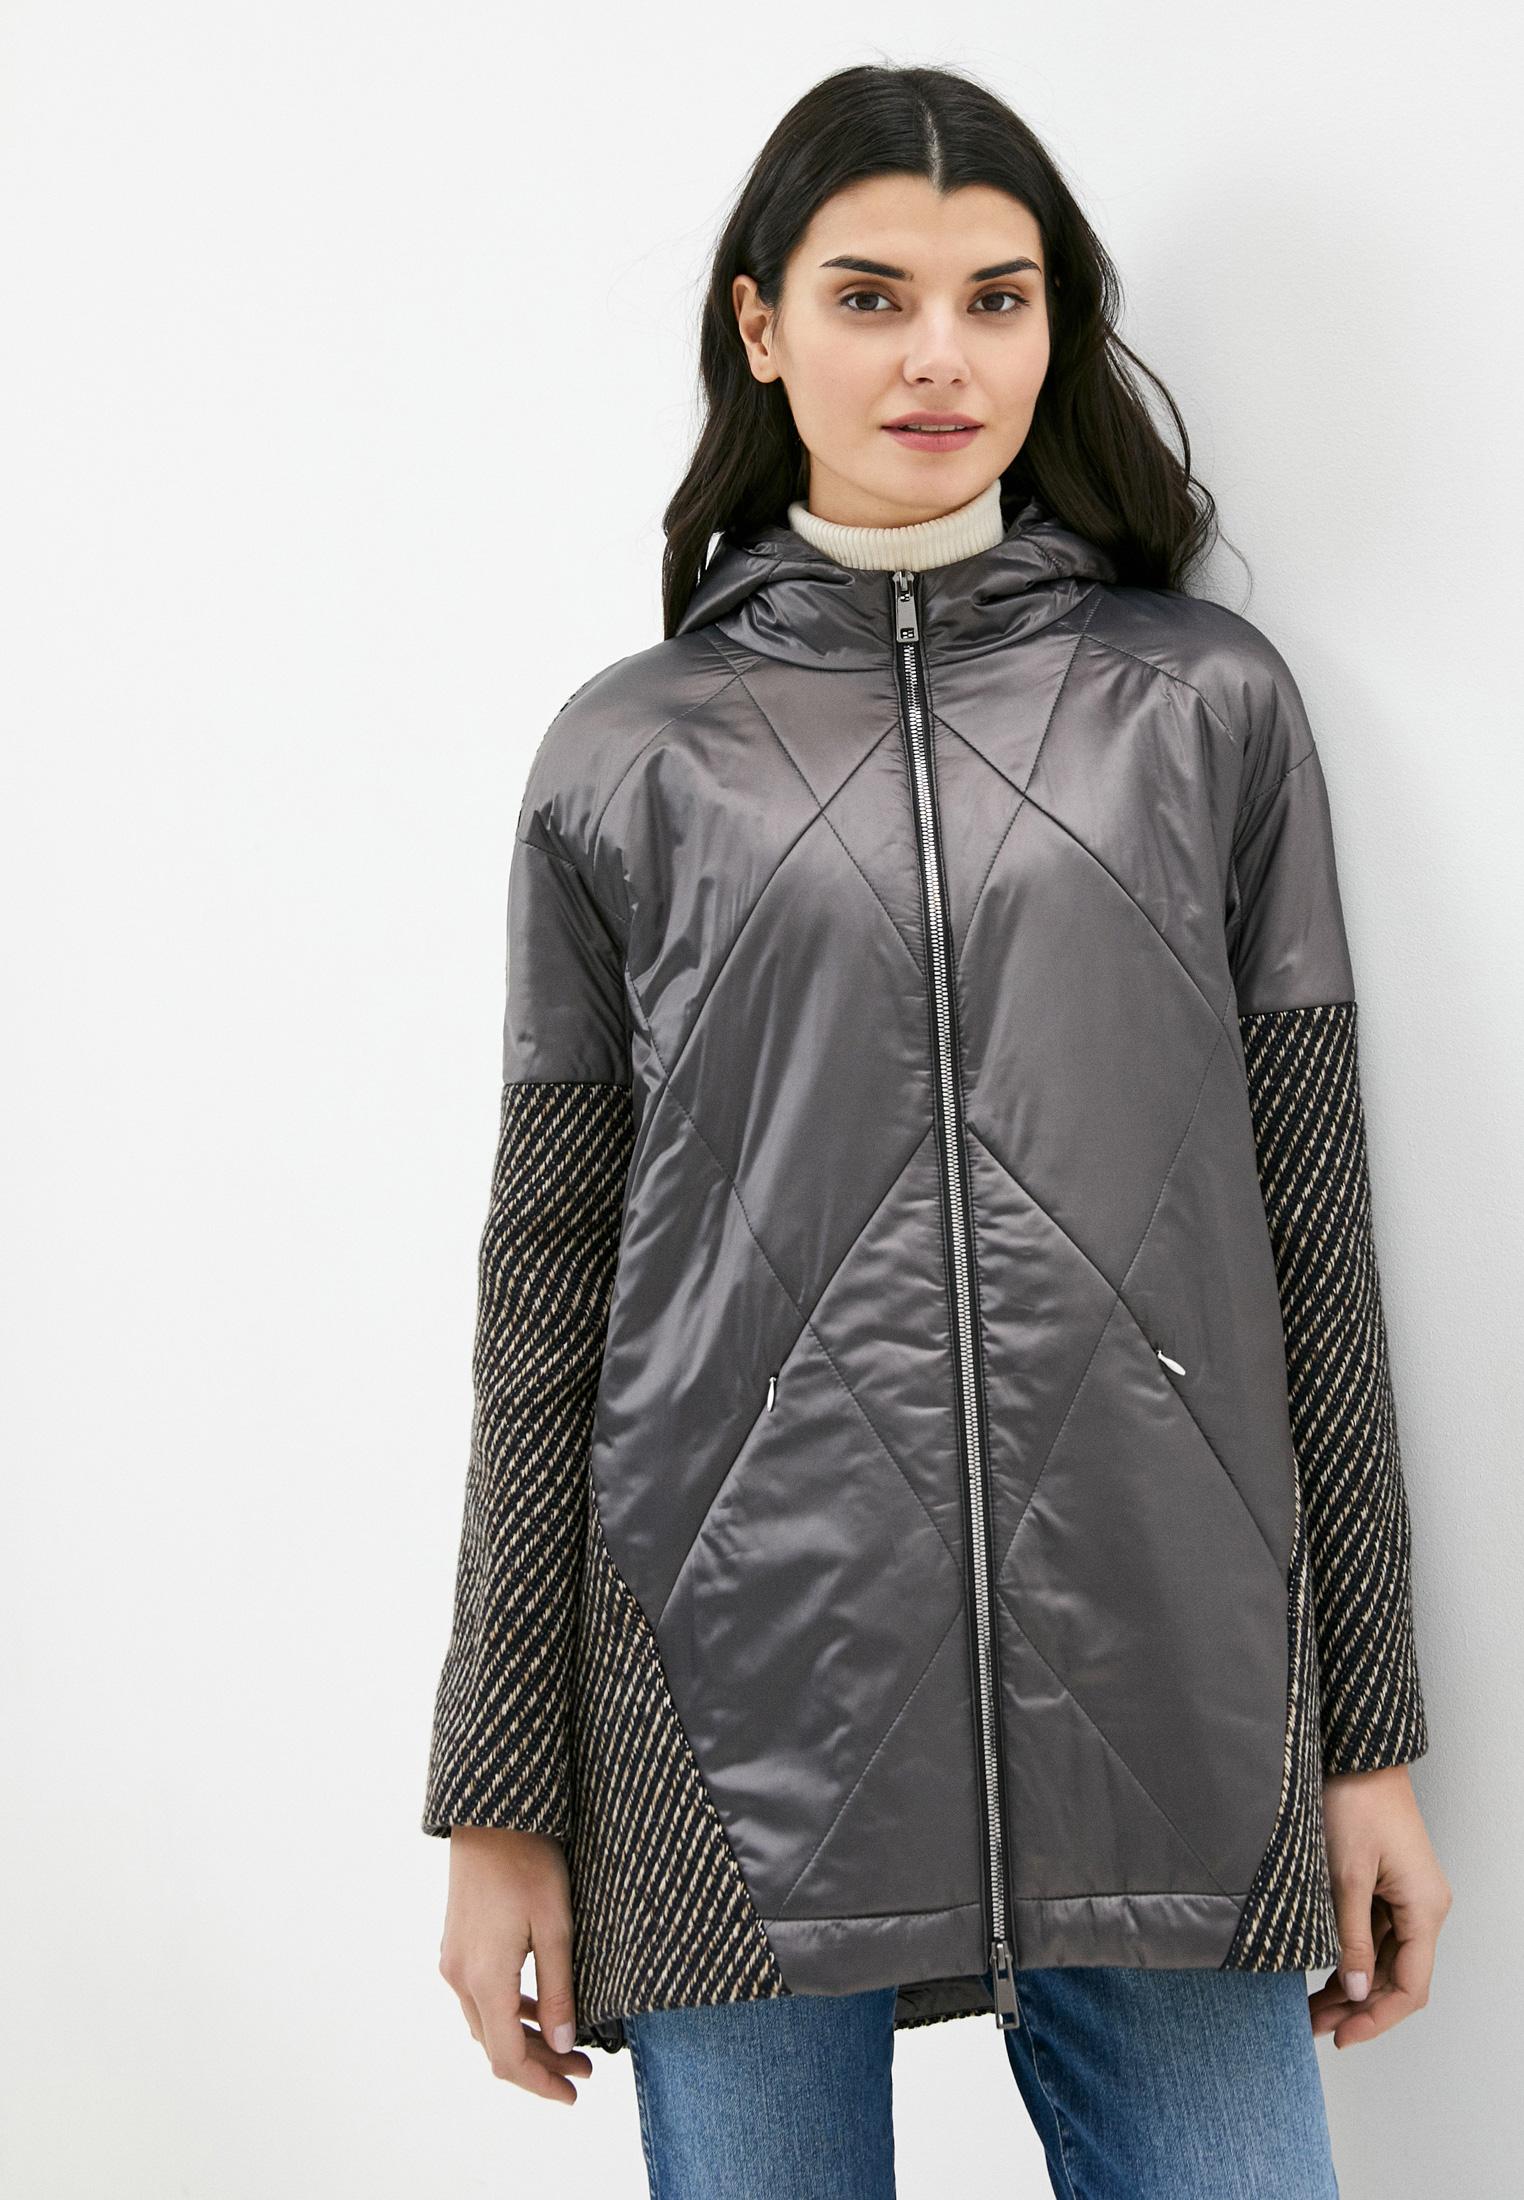 Утепленная куртка Nataliy Beate Куртка утепленная Nataliy Beate